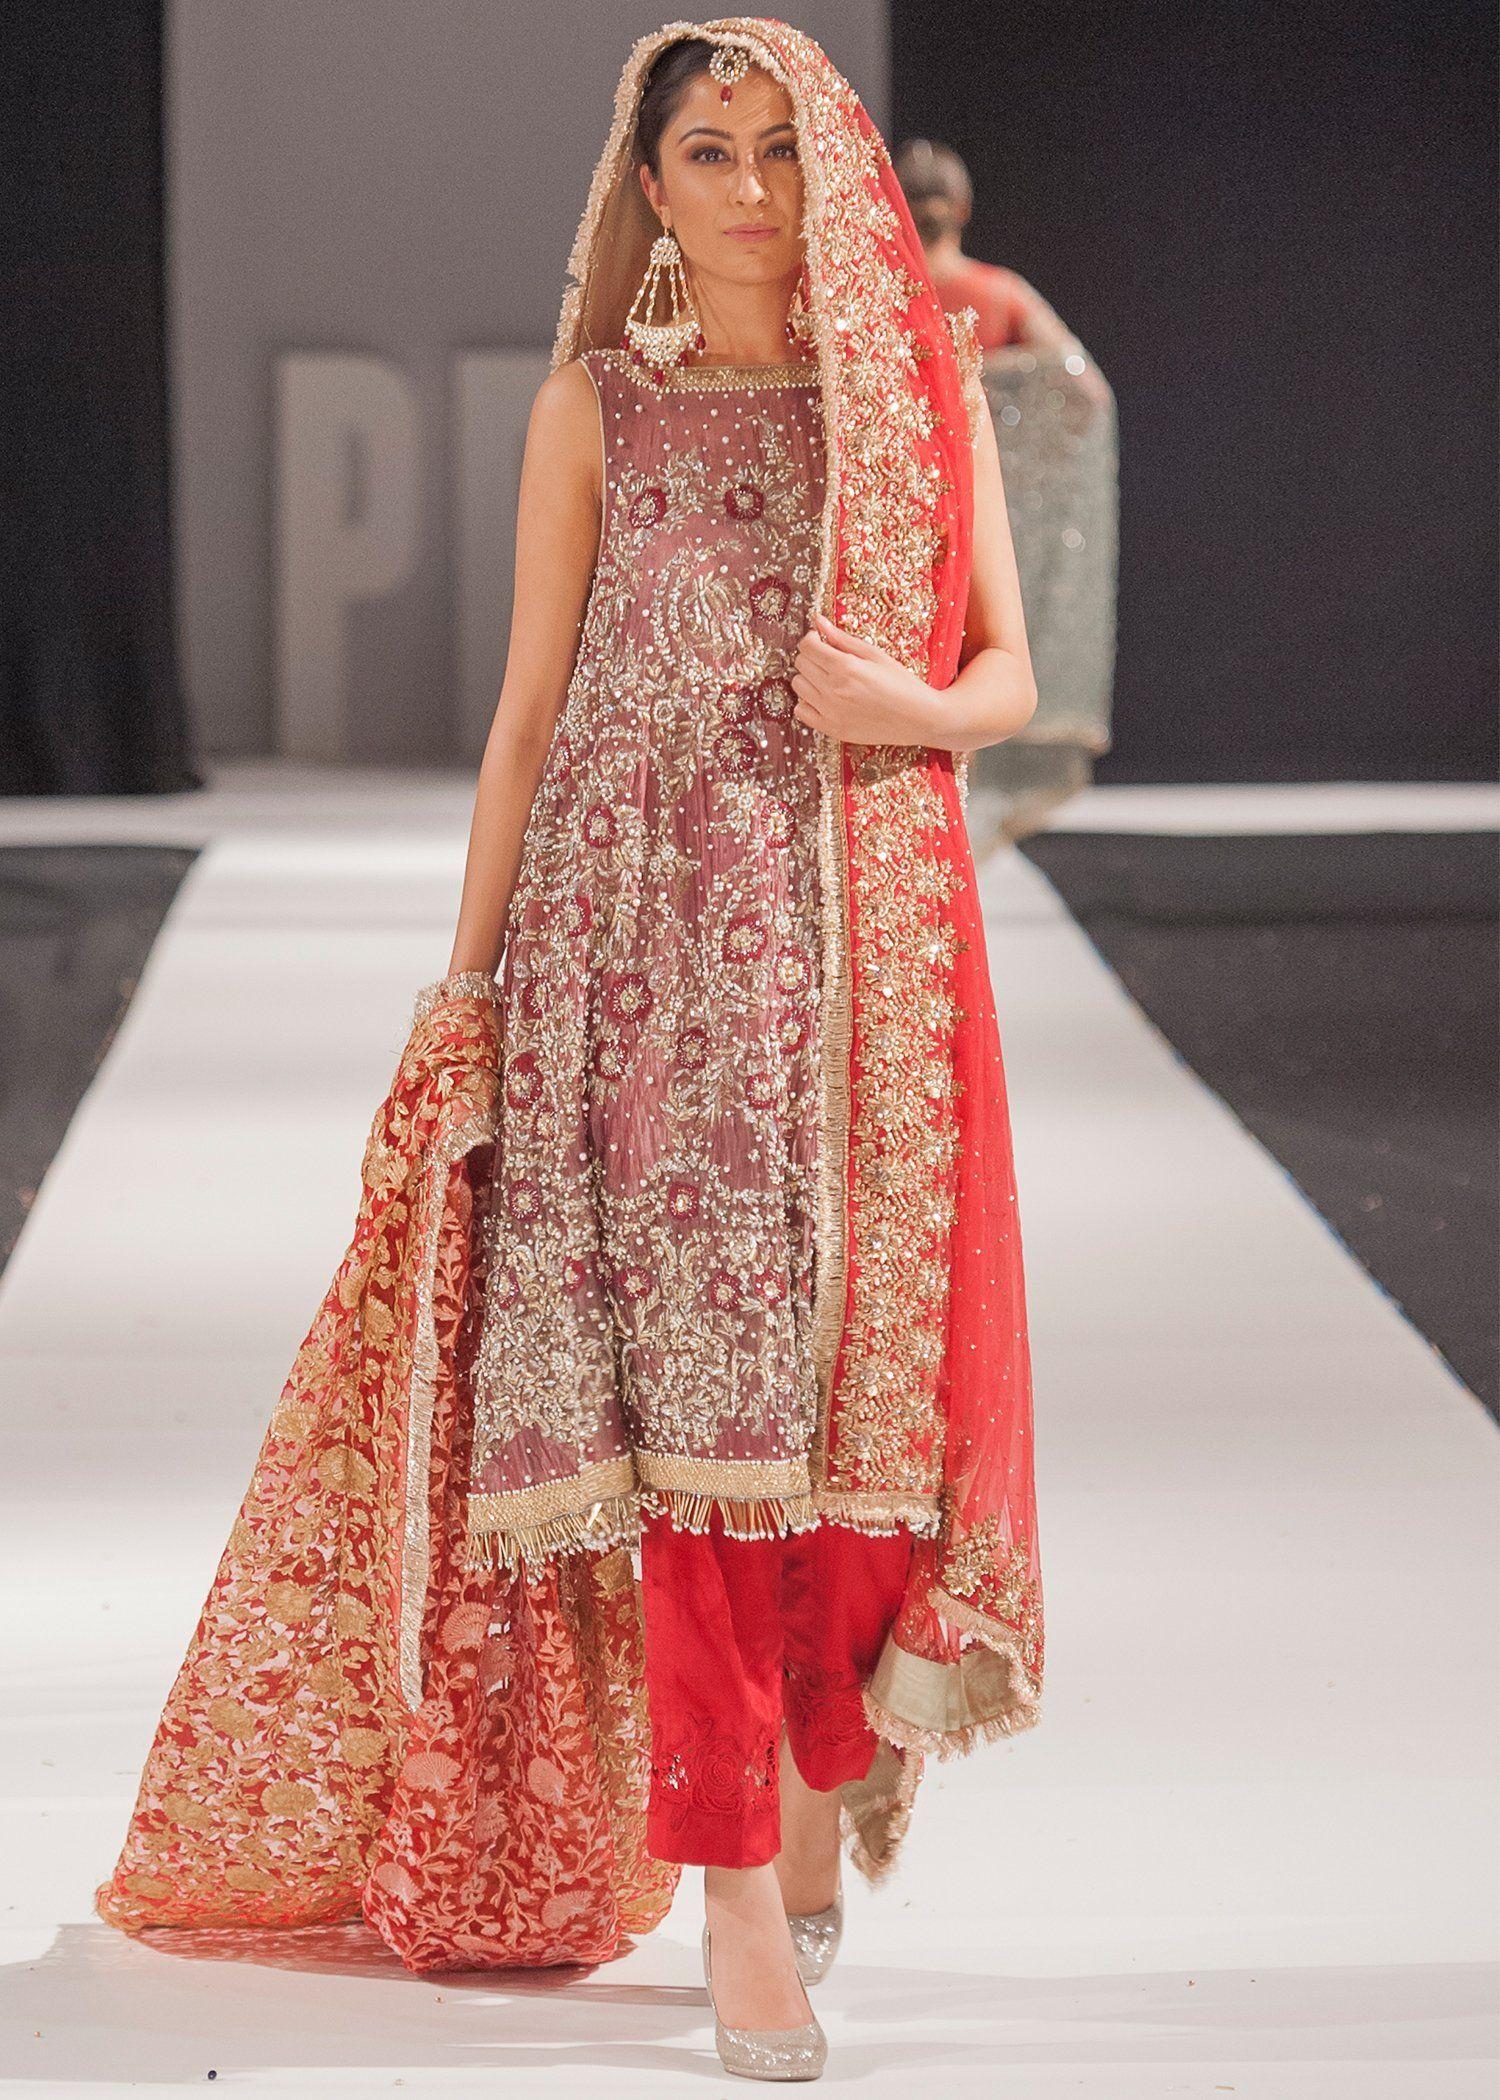 pakistani wedding dresses online canada